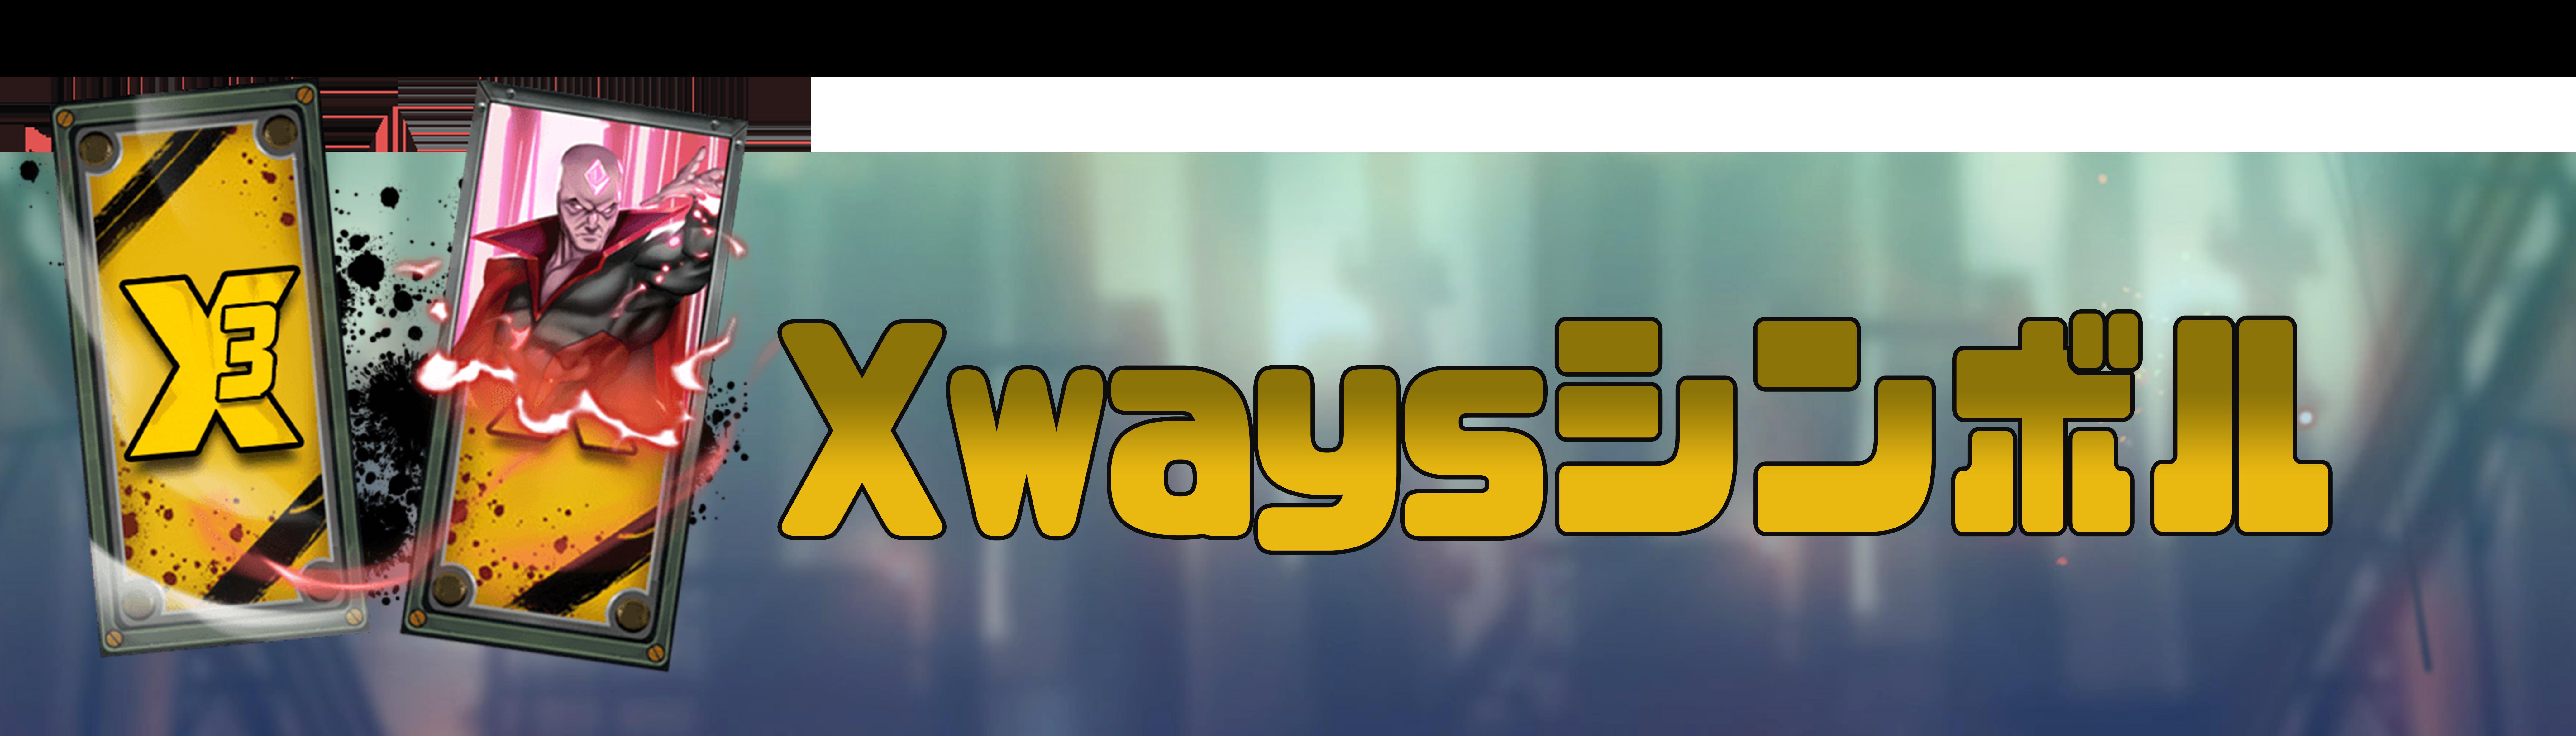 Xwaysシンボル